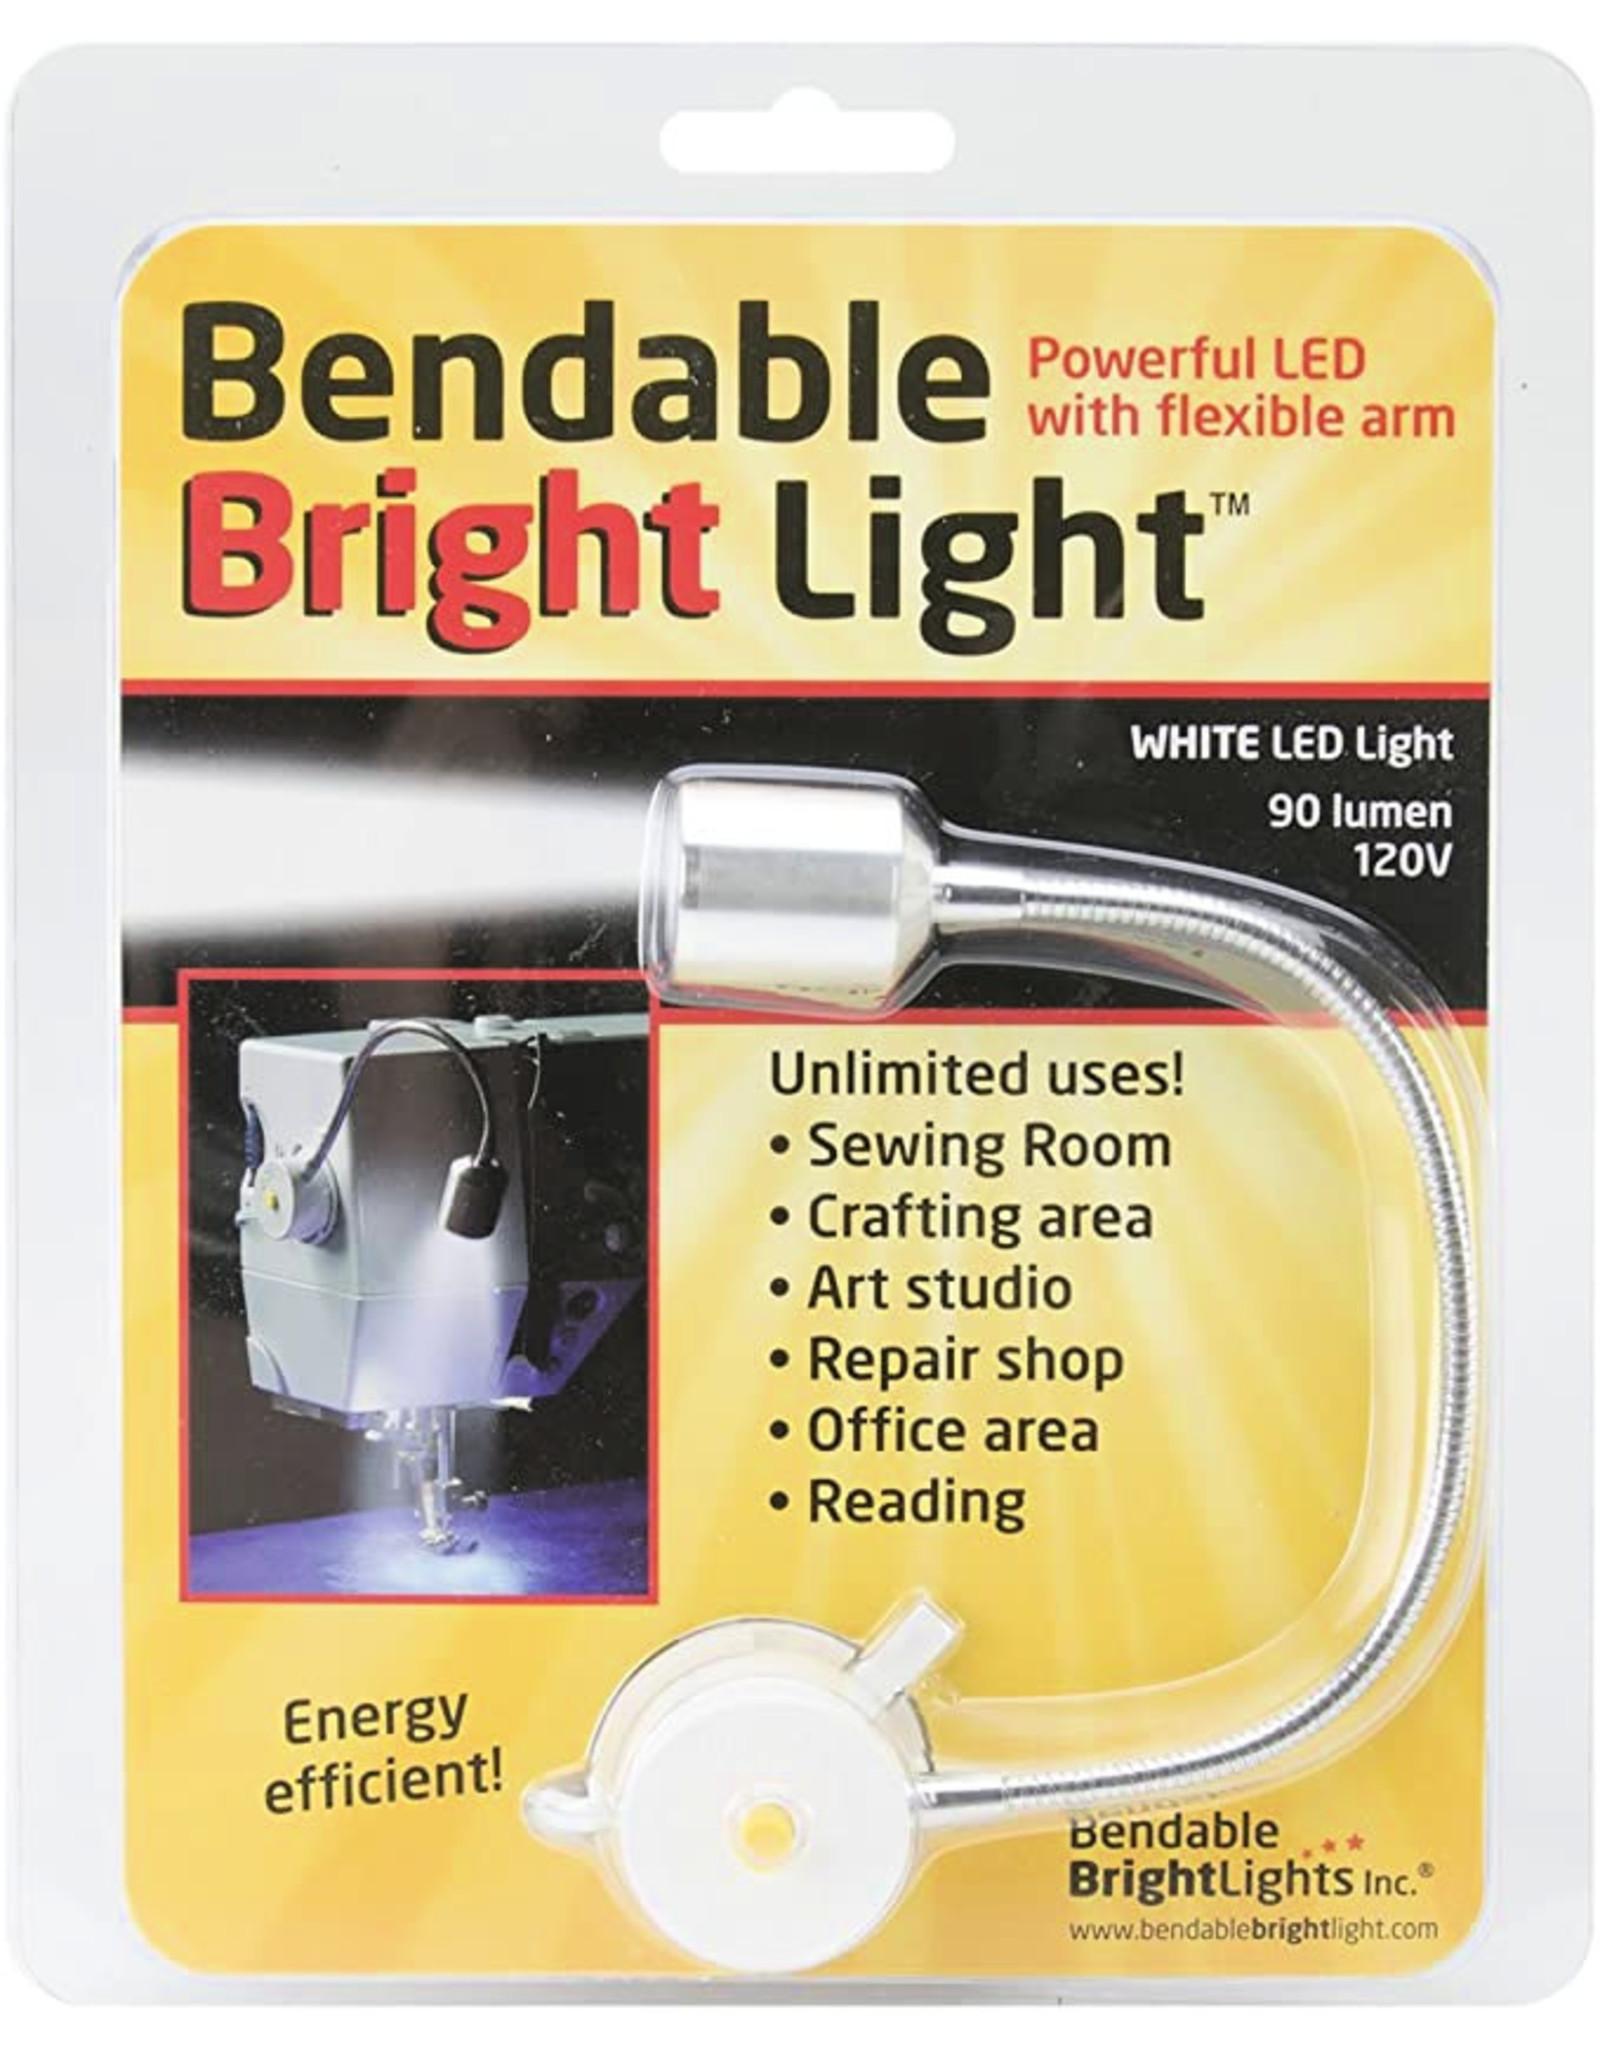 PD Bendable Bright Light by DreamWorld Inc.